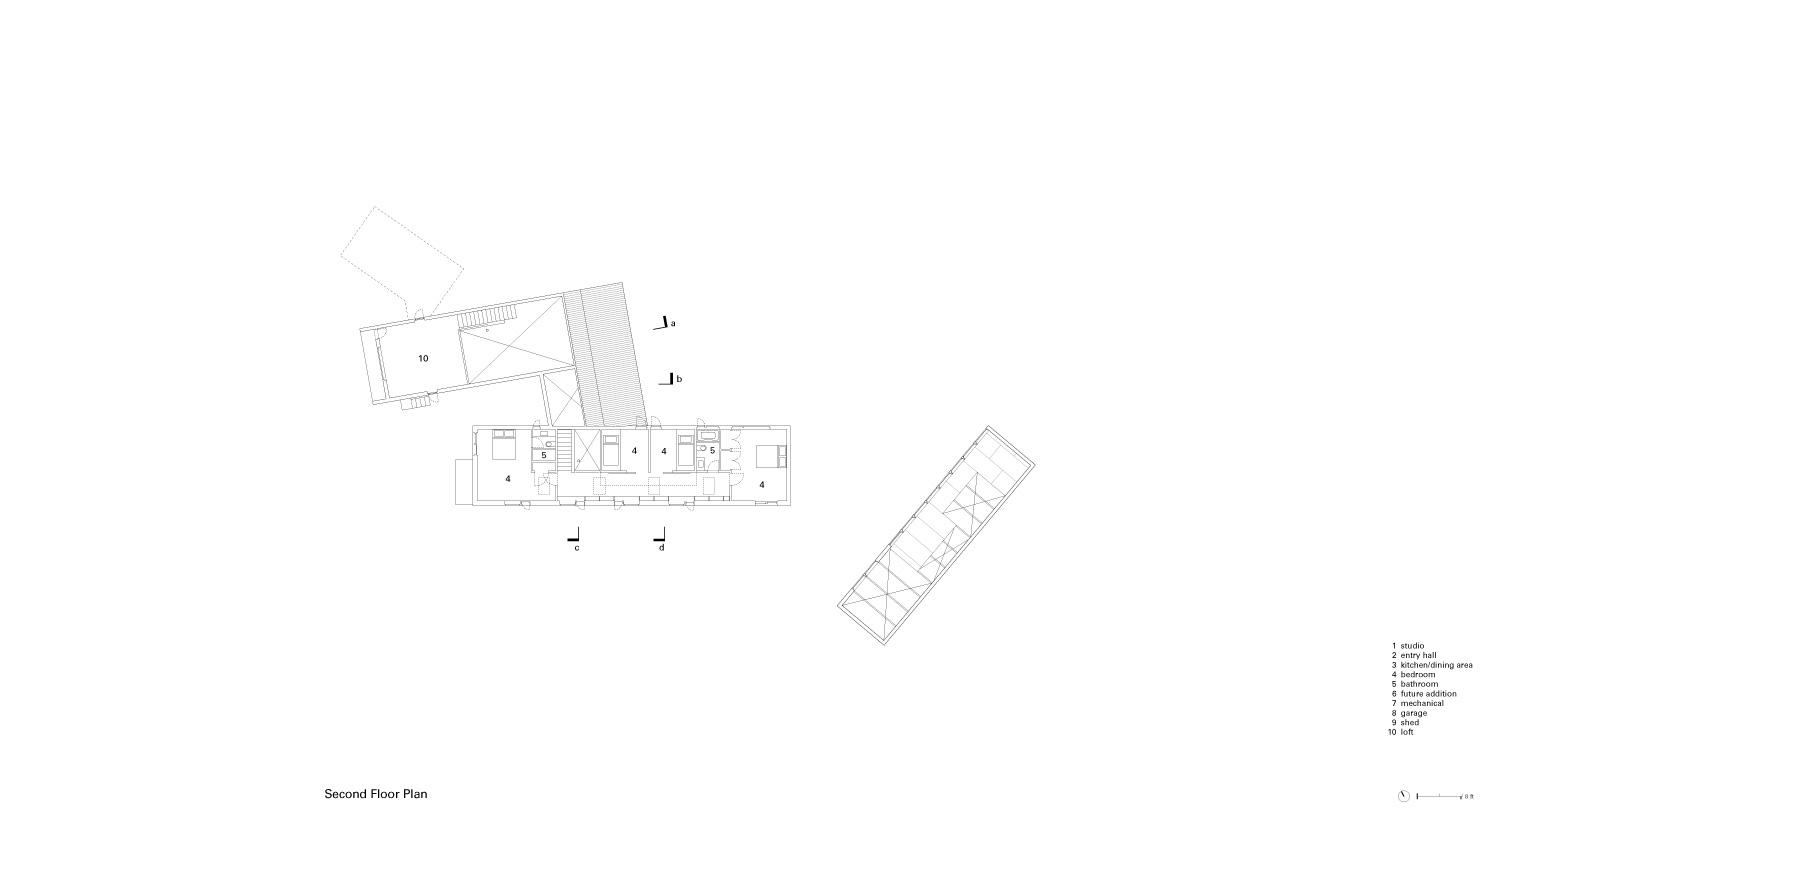 putney_plan2.jpg